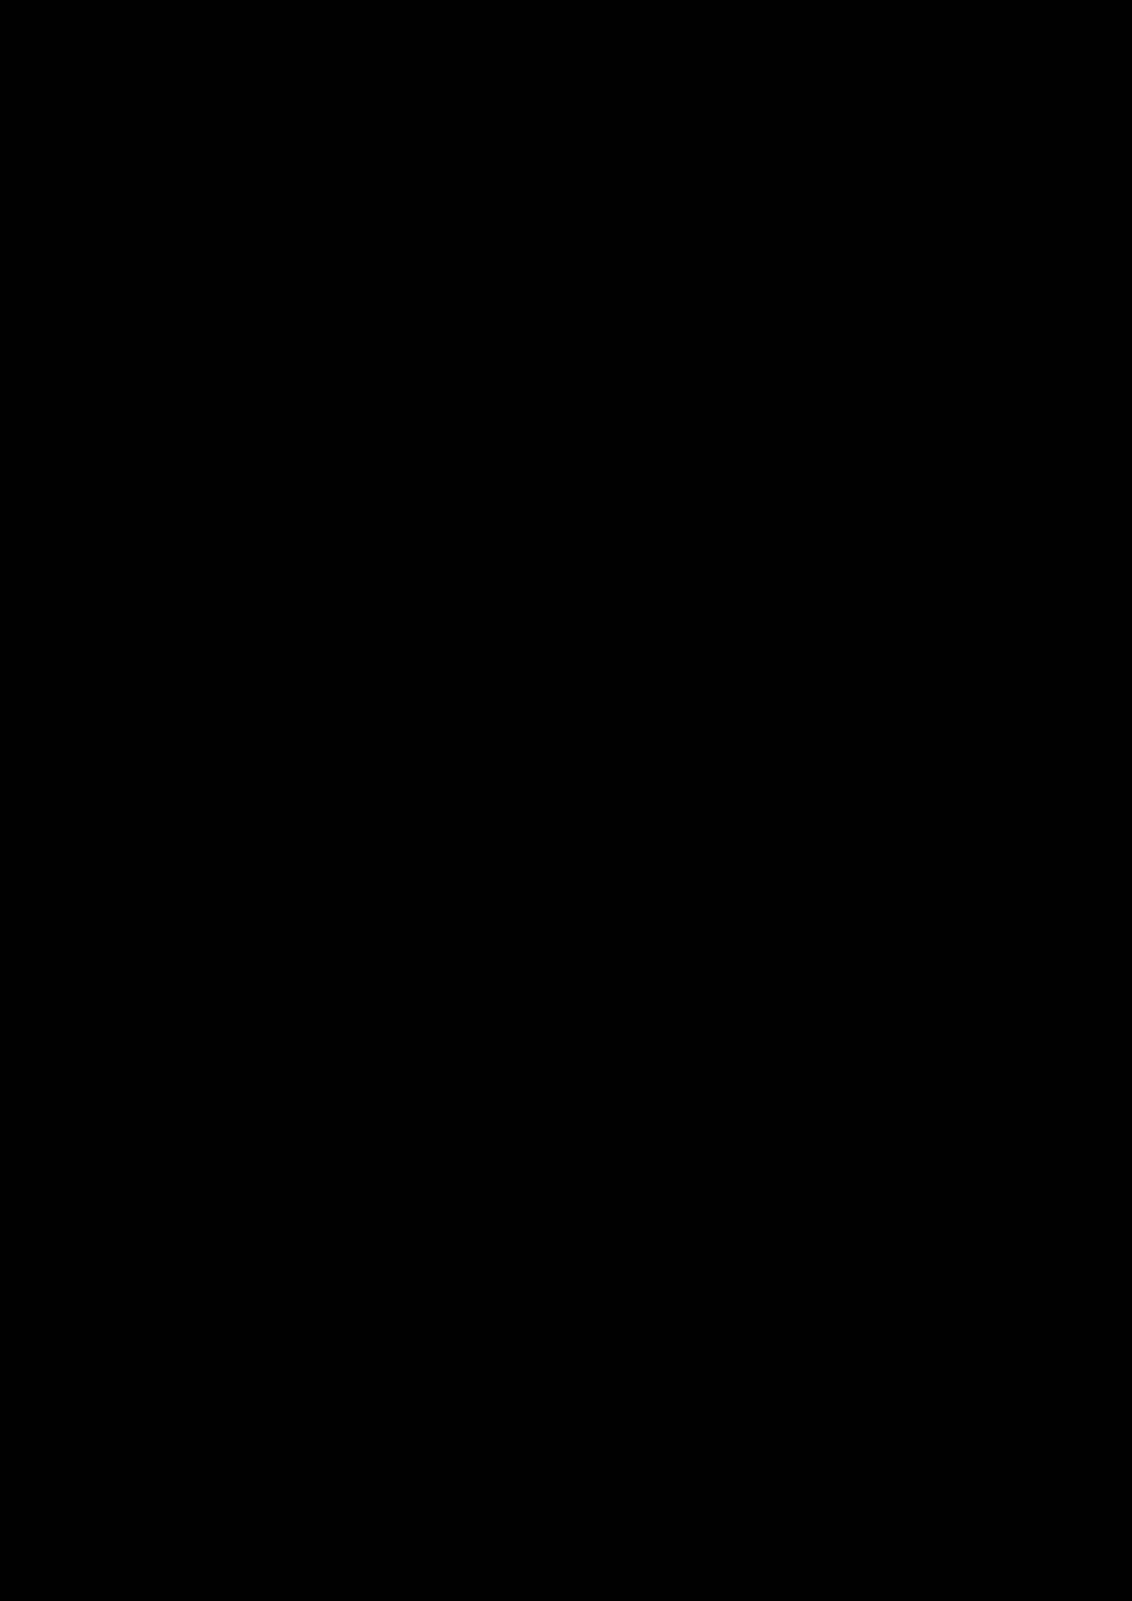 Belyiy sokol slide, Image 205